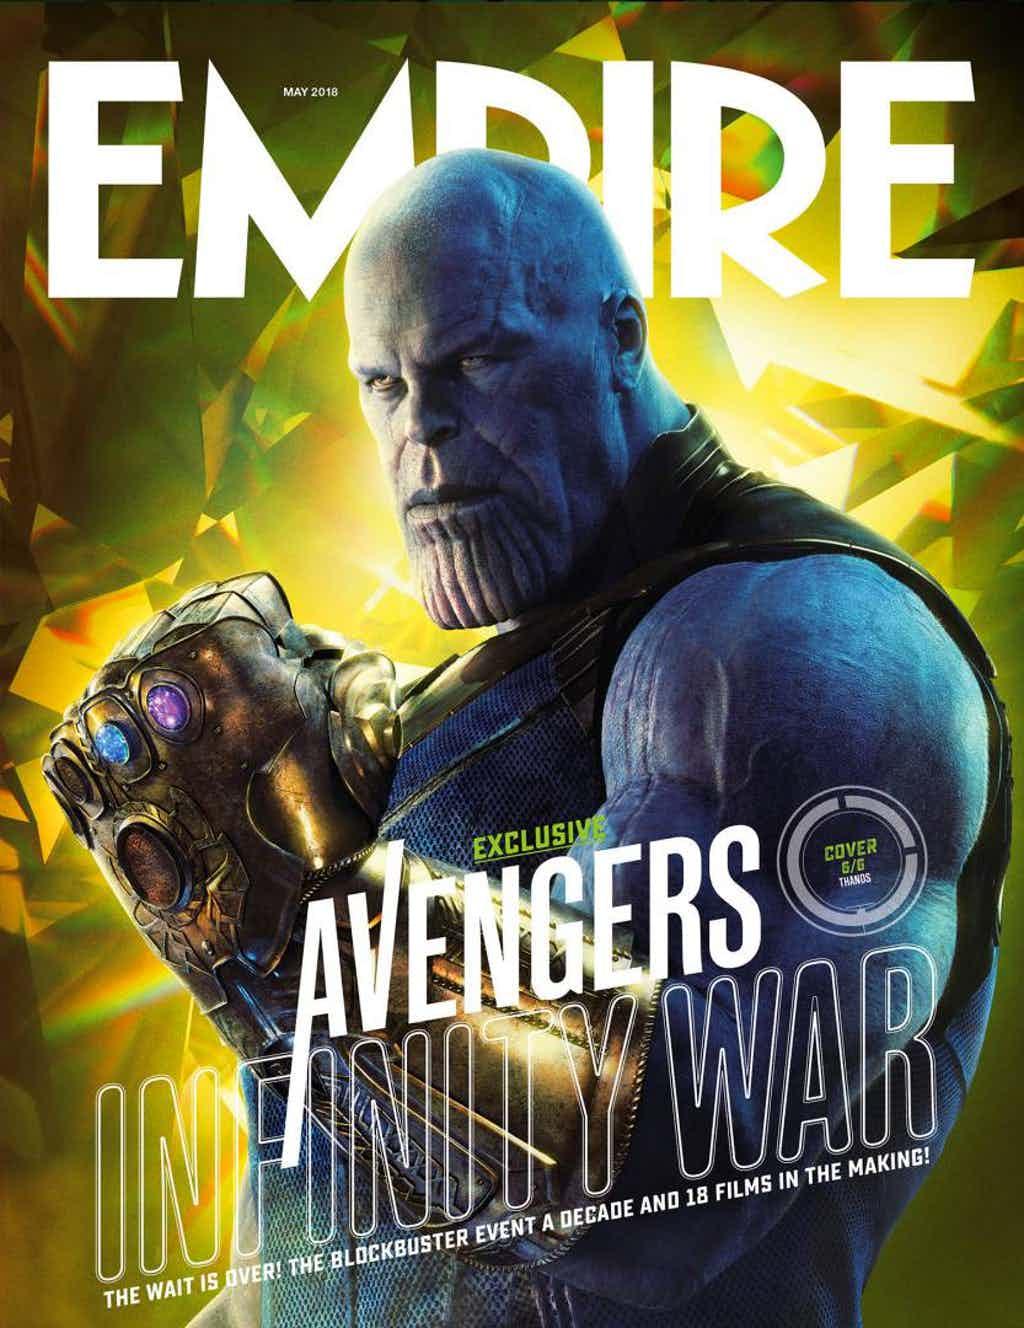 szmk_avengers_bosszuallok_infinity_war_vegtelen_haboru_marvel_empire_5.jpg